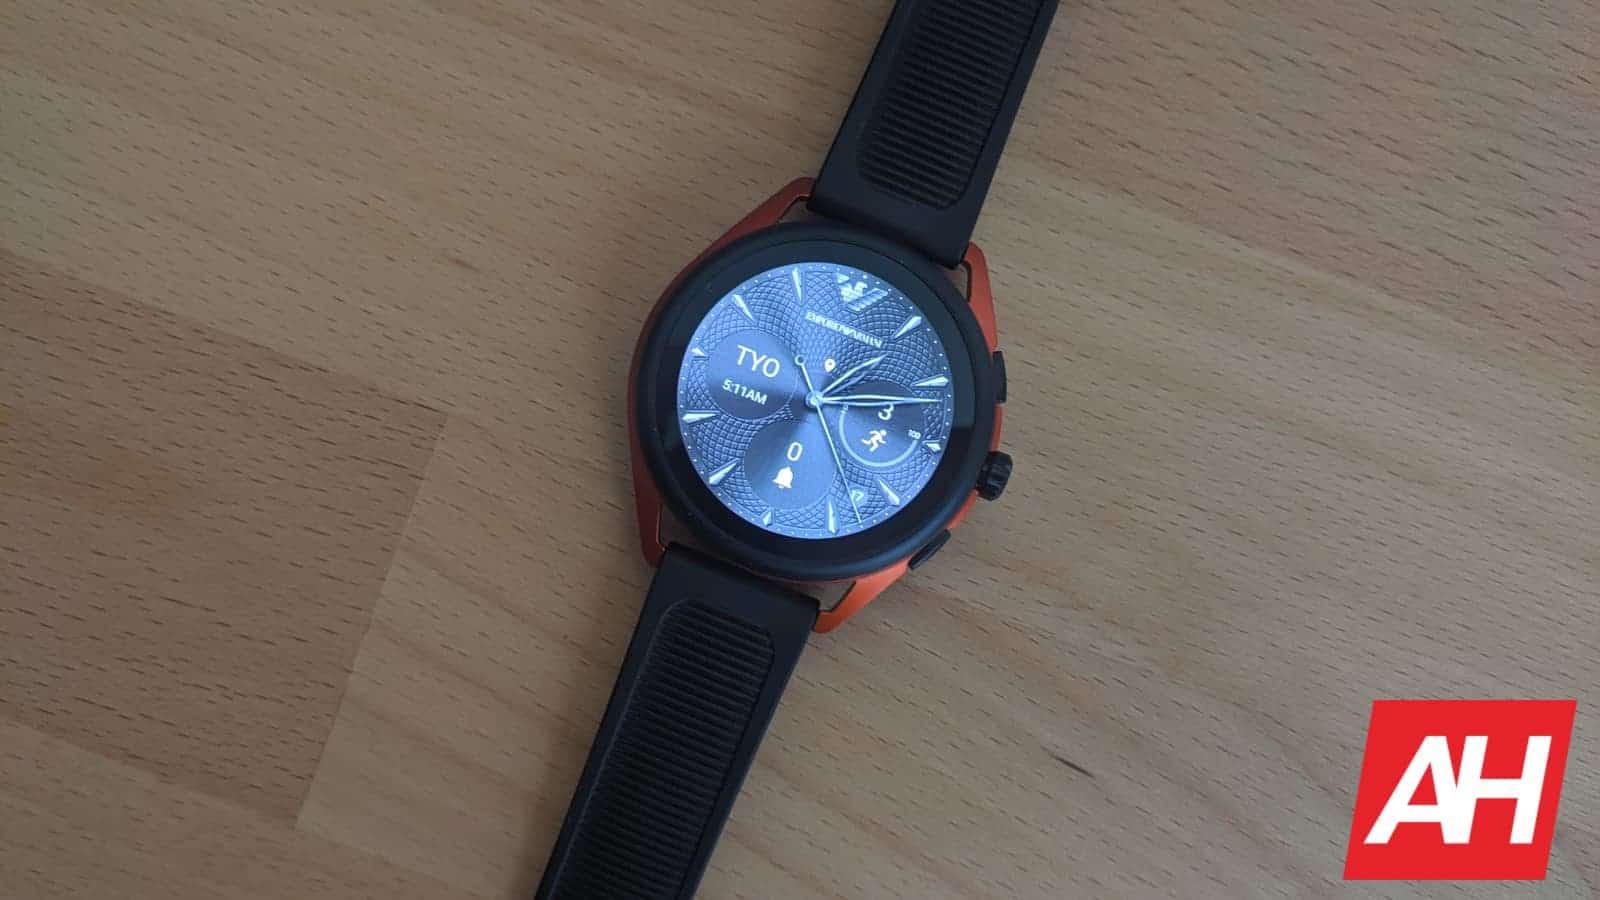 Emporio Armani Smartwatch 3 Review 11